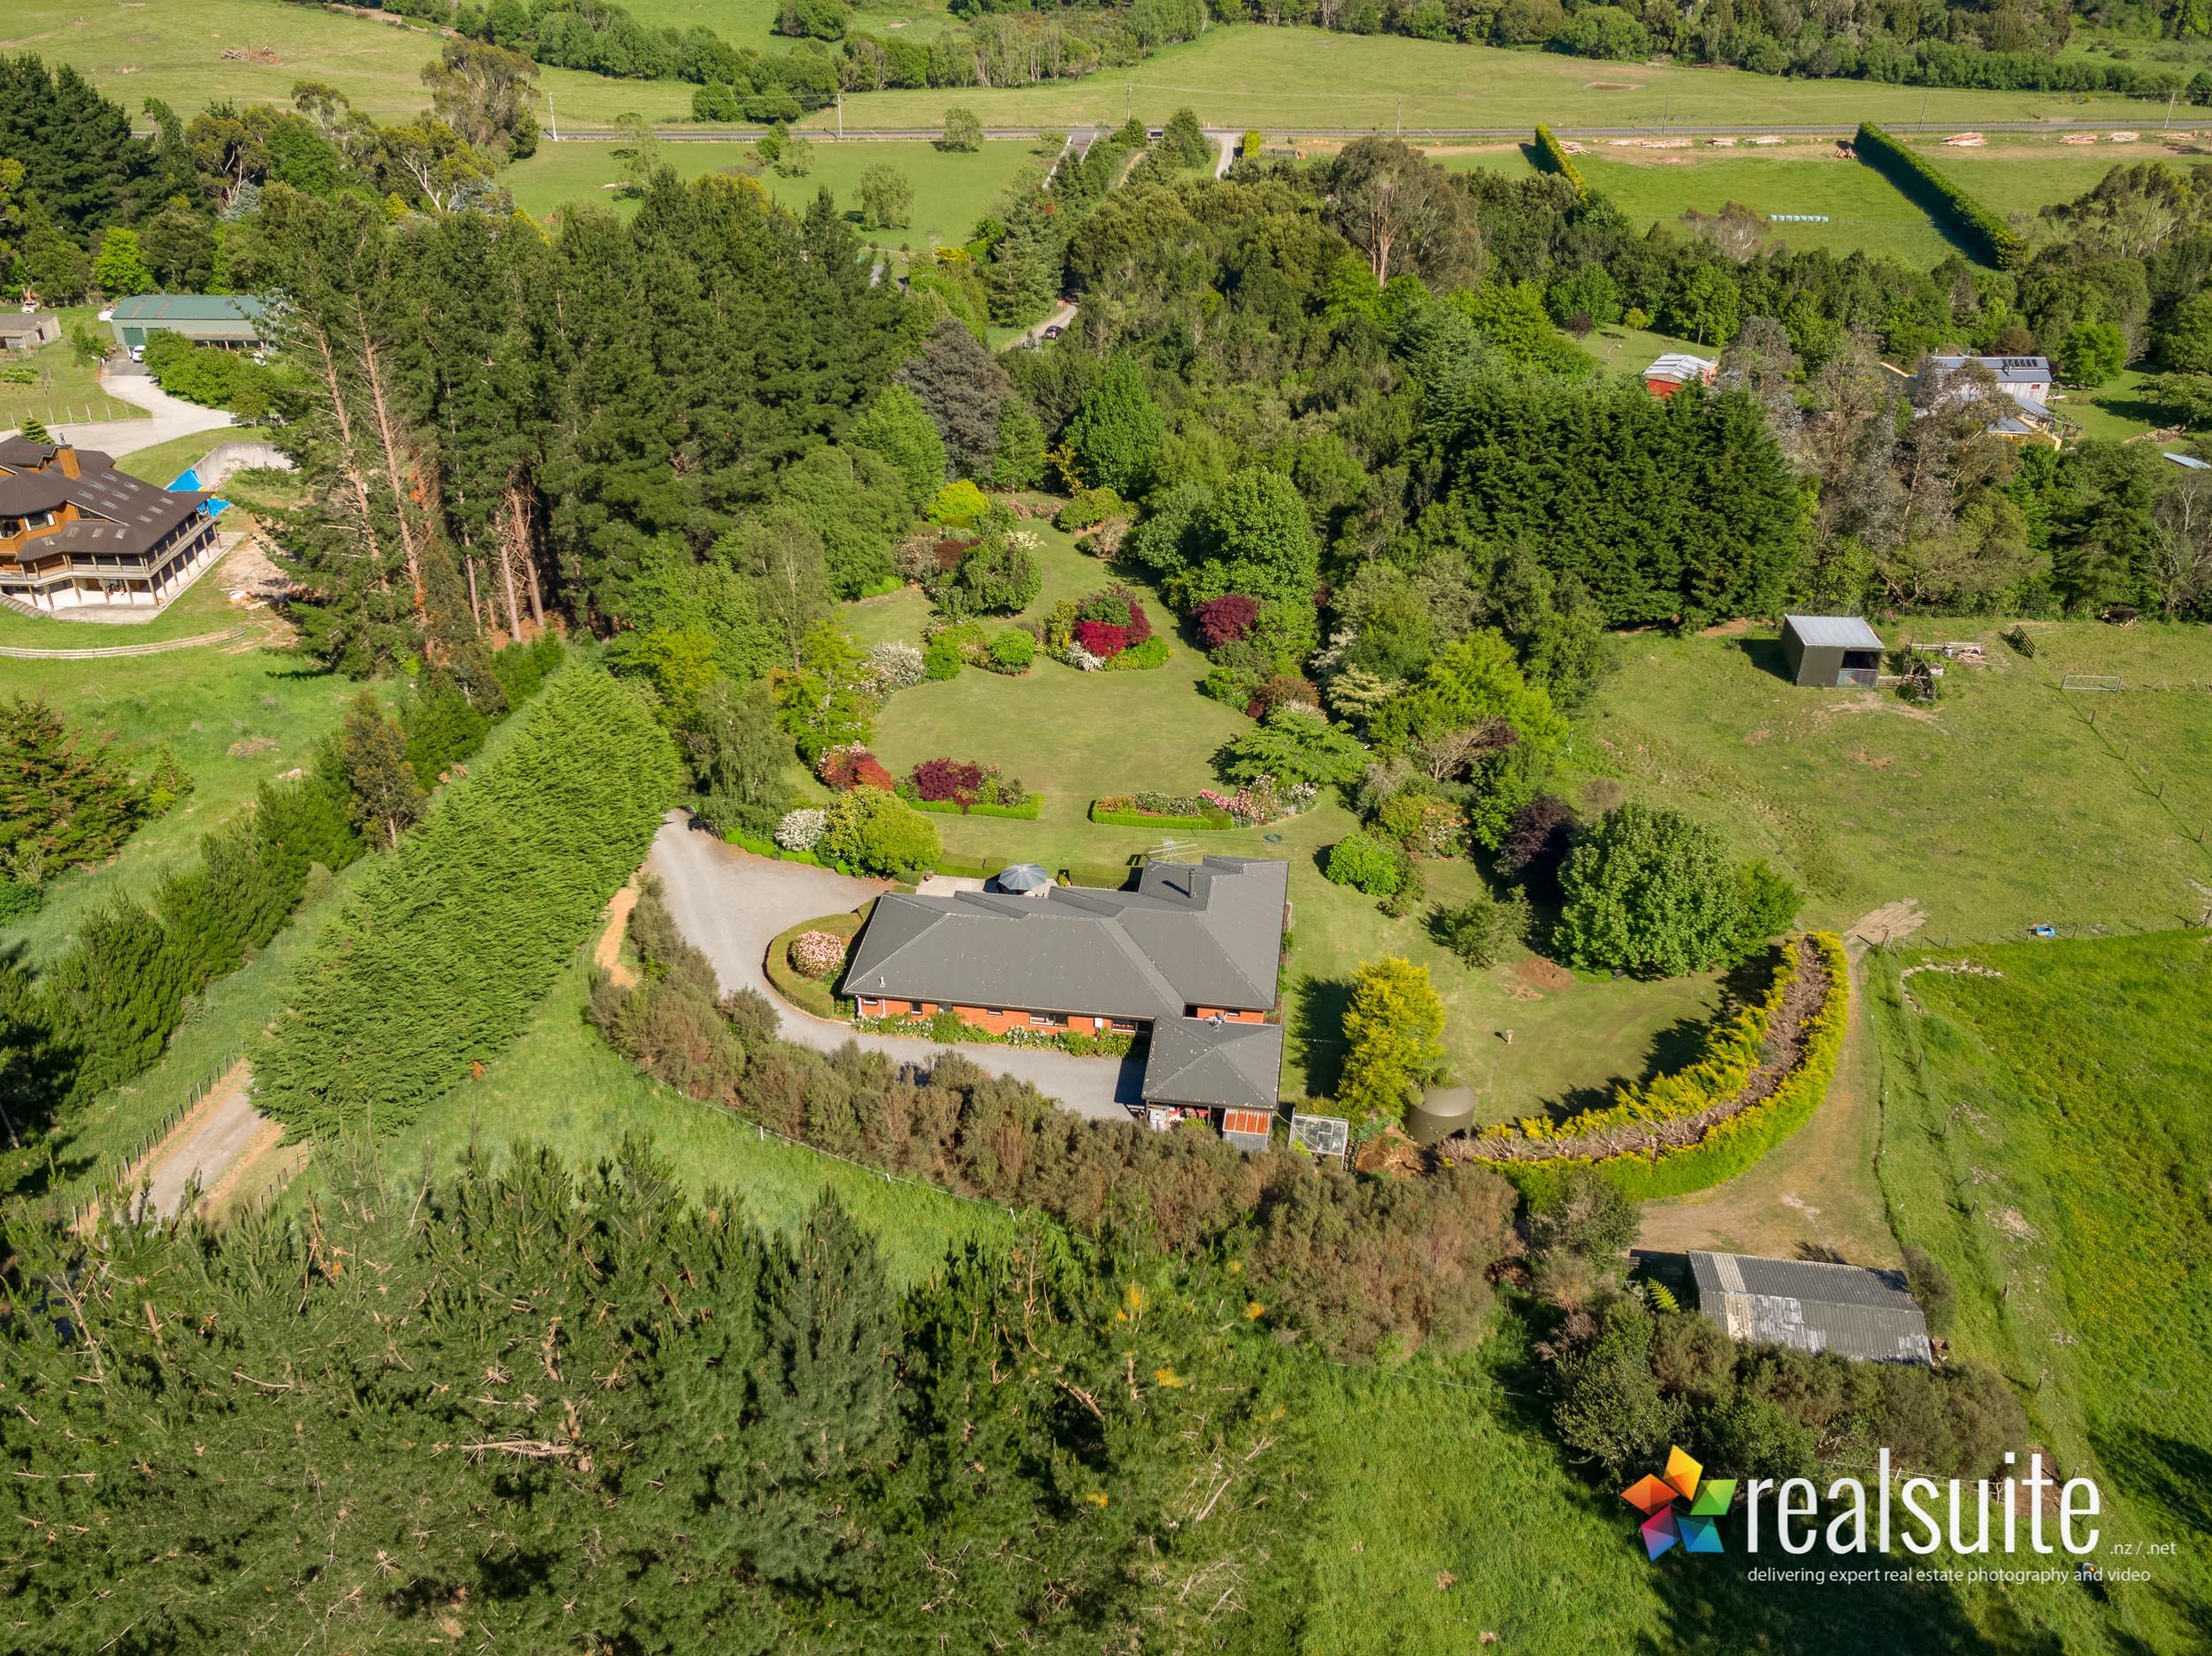 227B Whitemans Valley Road Aerial 0020